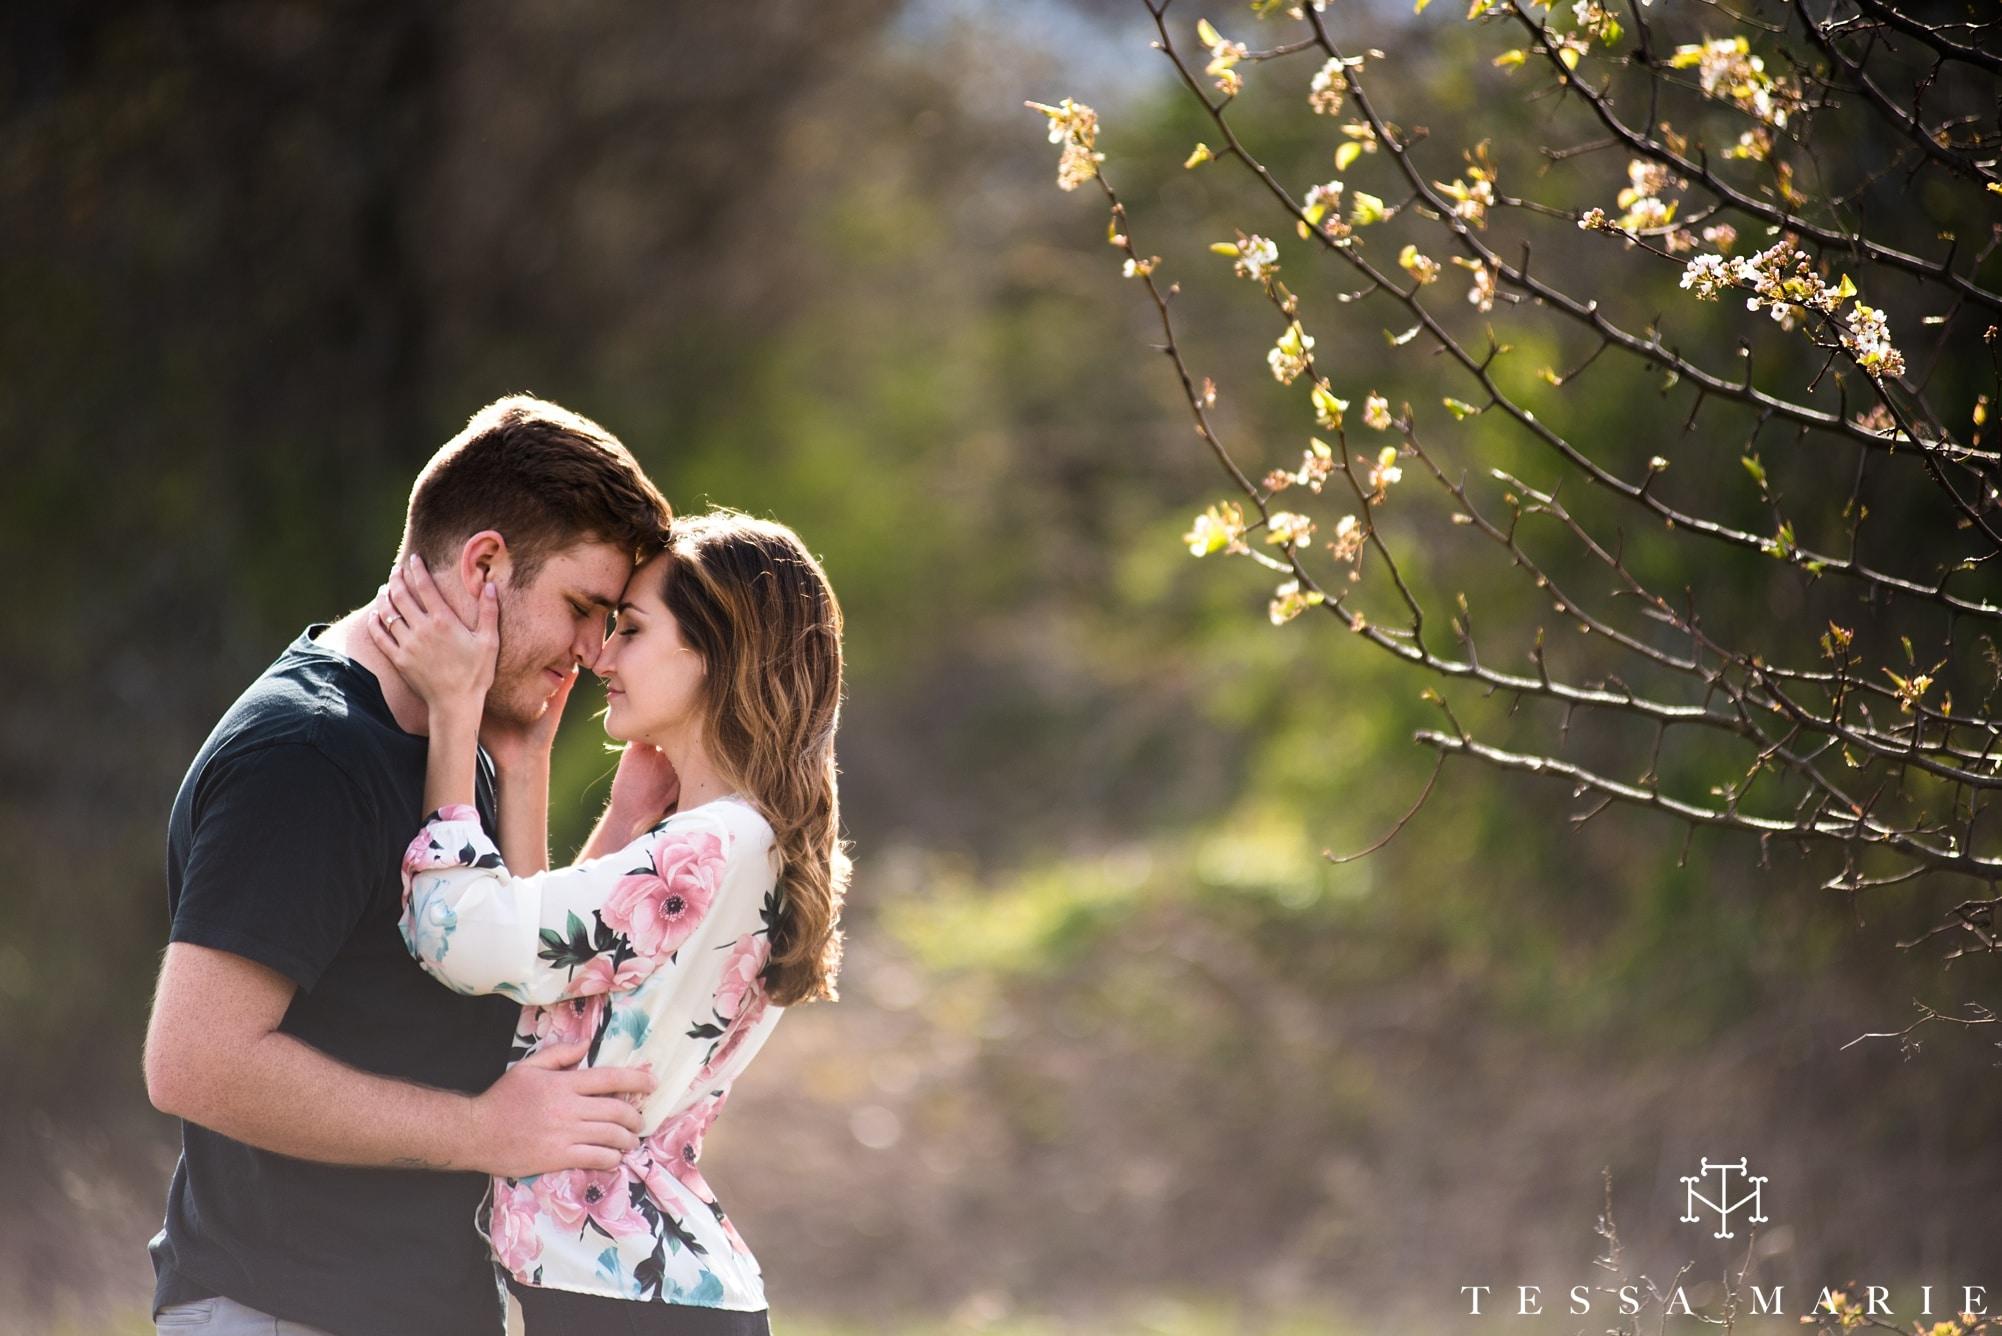 tessa_marie_studios_tessa_marie_weddings_proposal_atlanta_engagement_pictures_0068